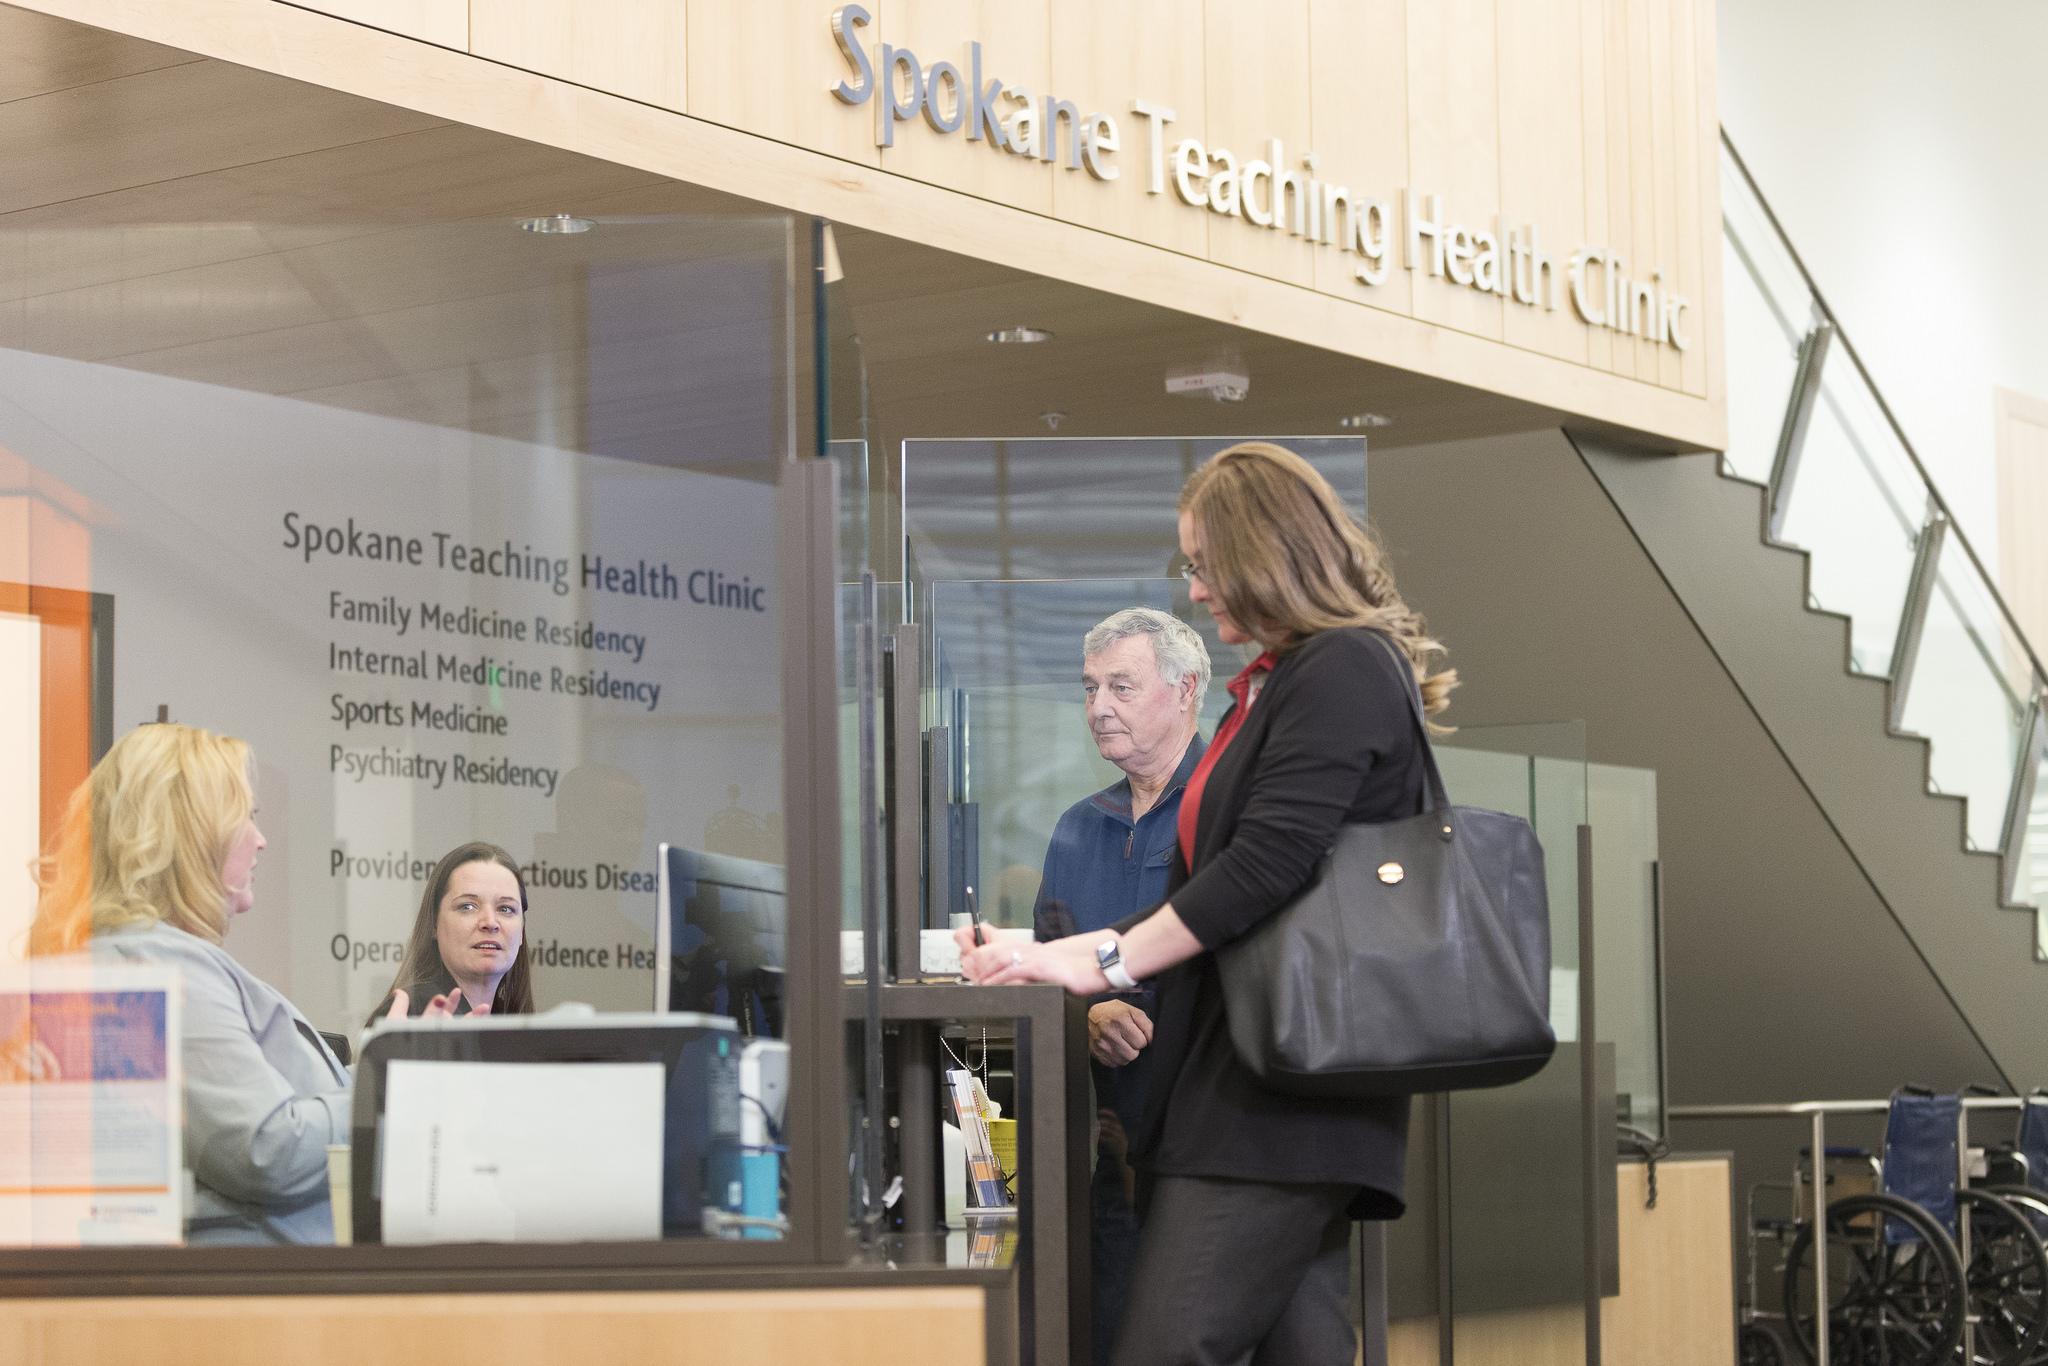 Lobby of the Spokane Teaching Health Clinic